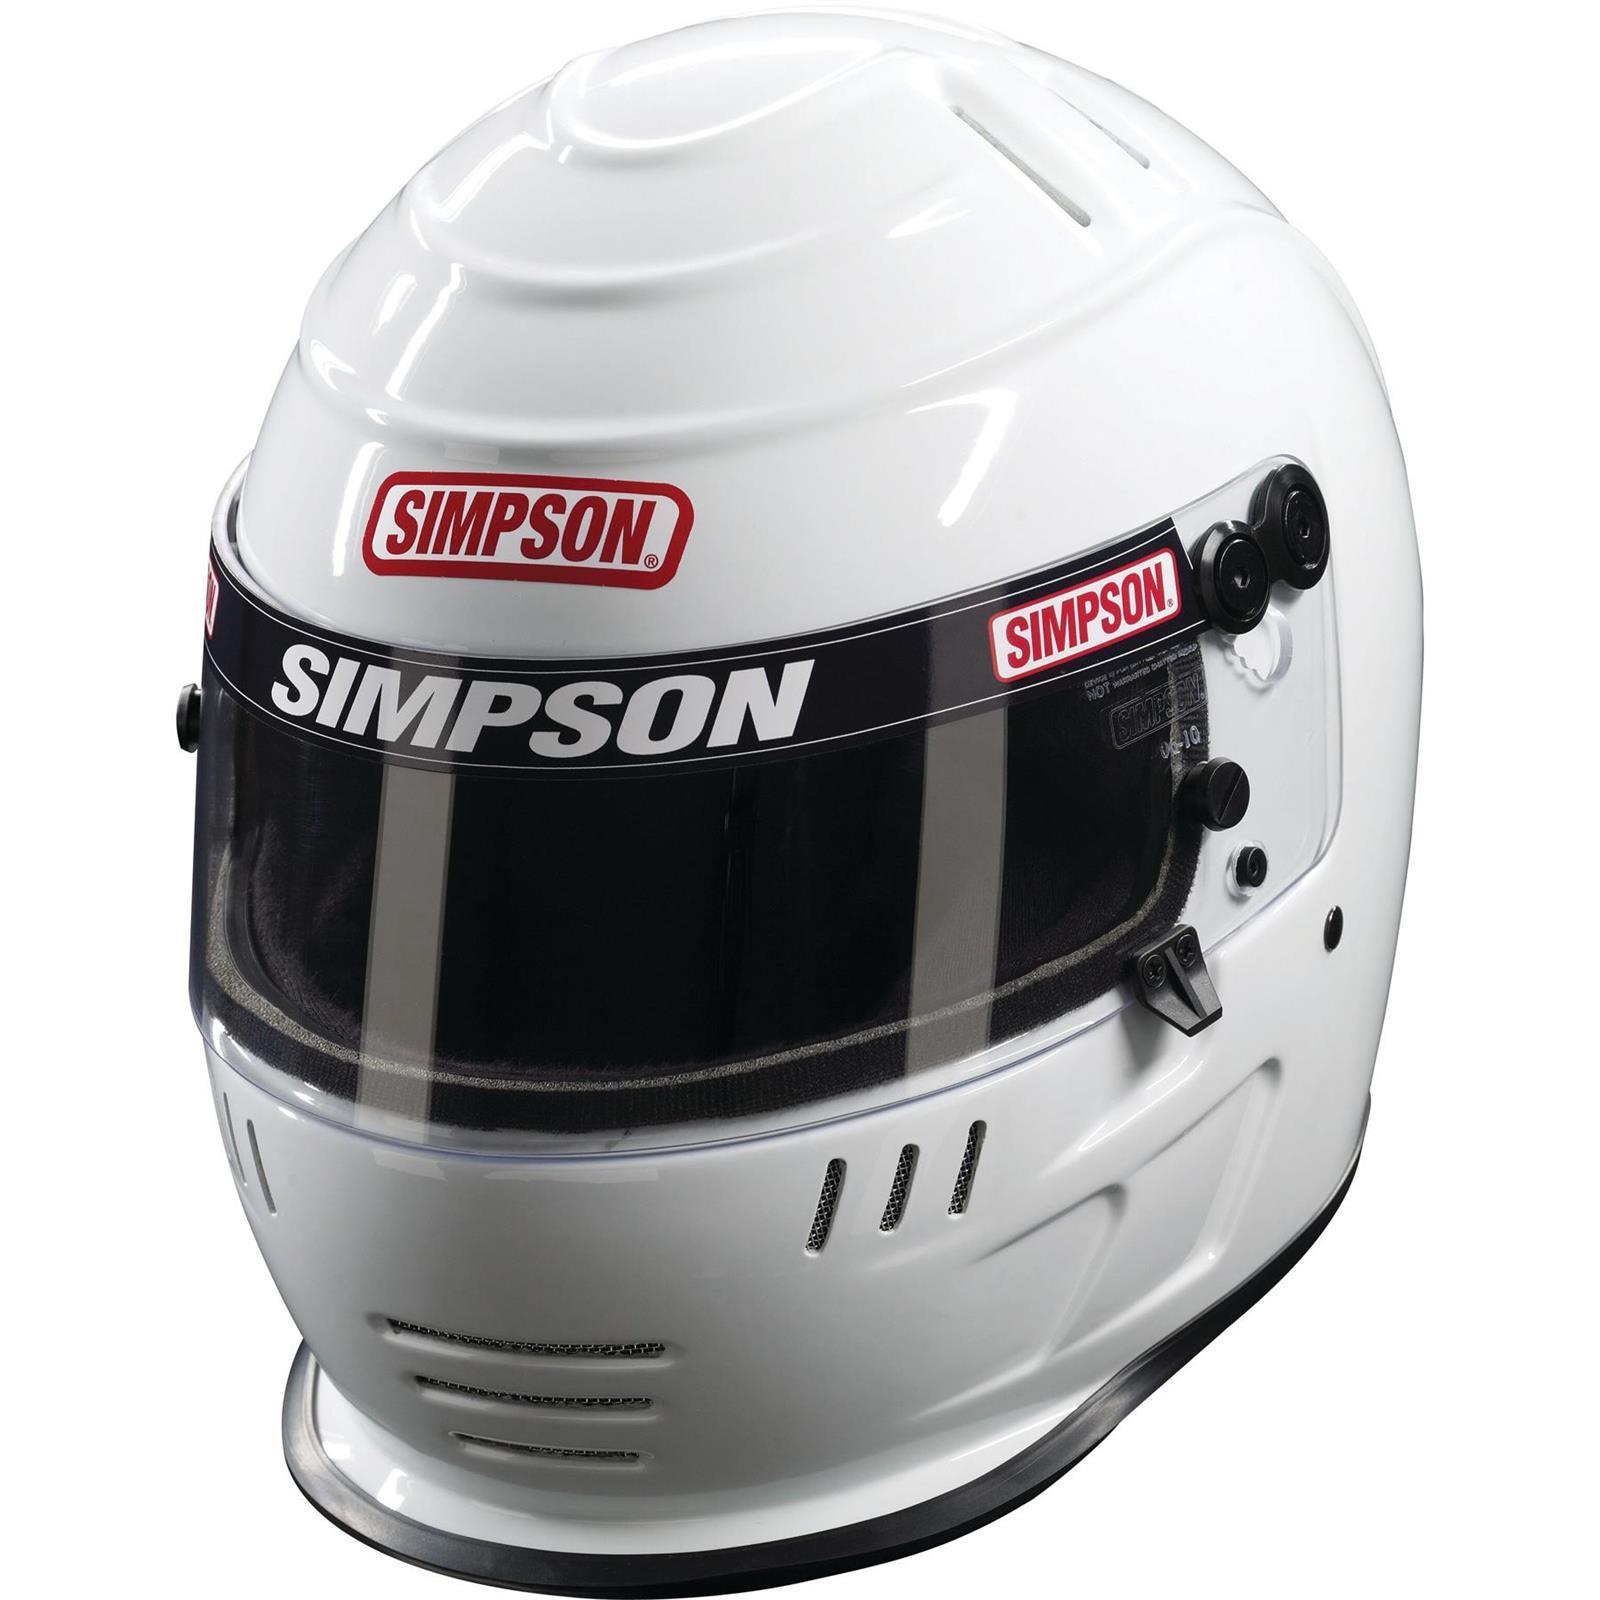 Simpson-Racing-Helmet-Speedway-Shark-SA2015